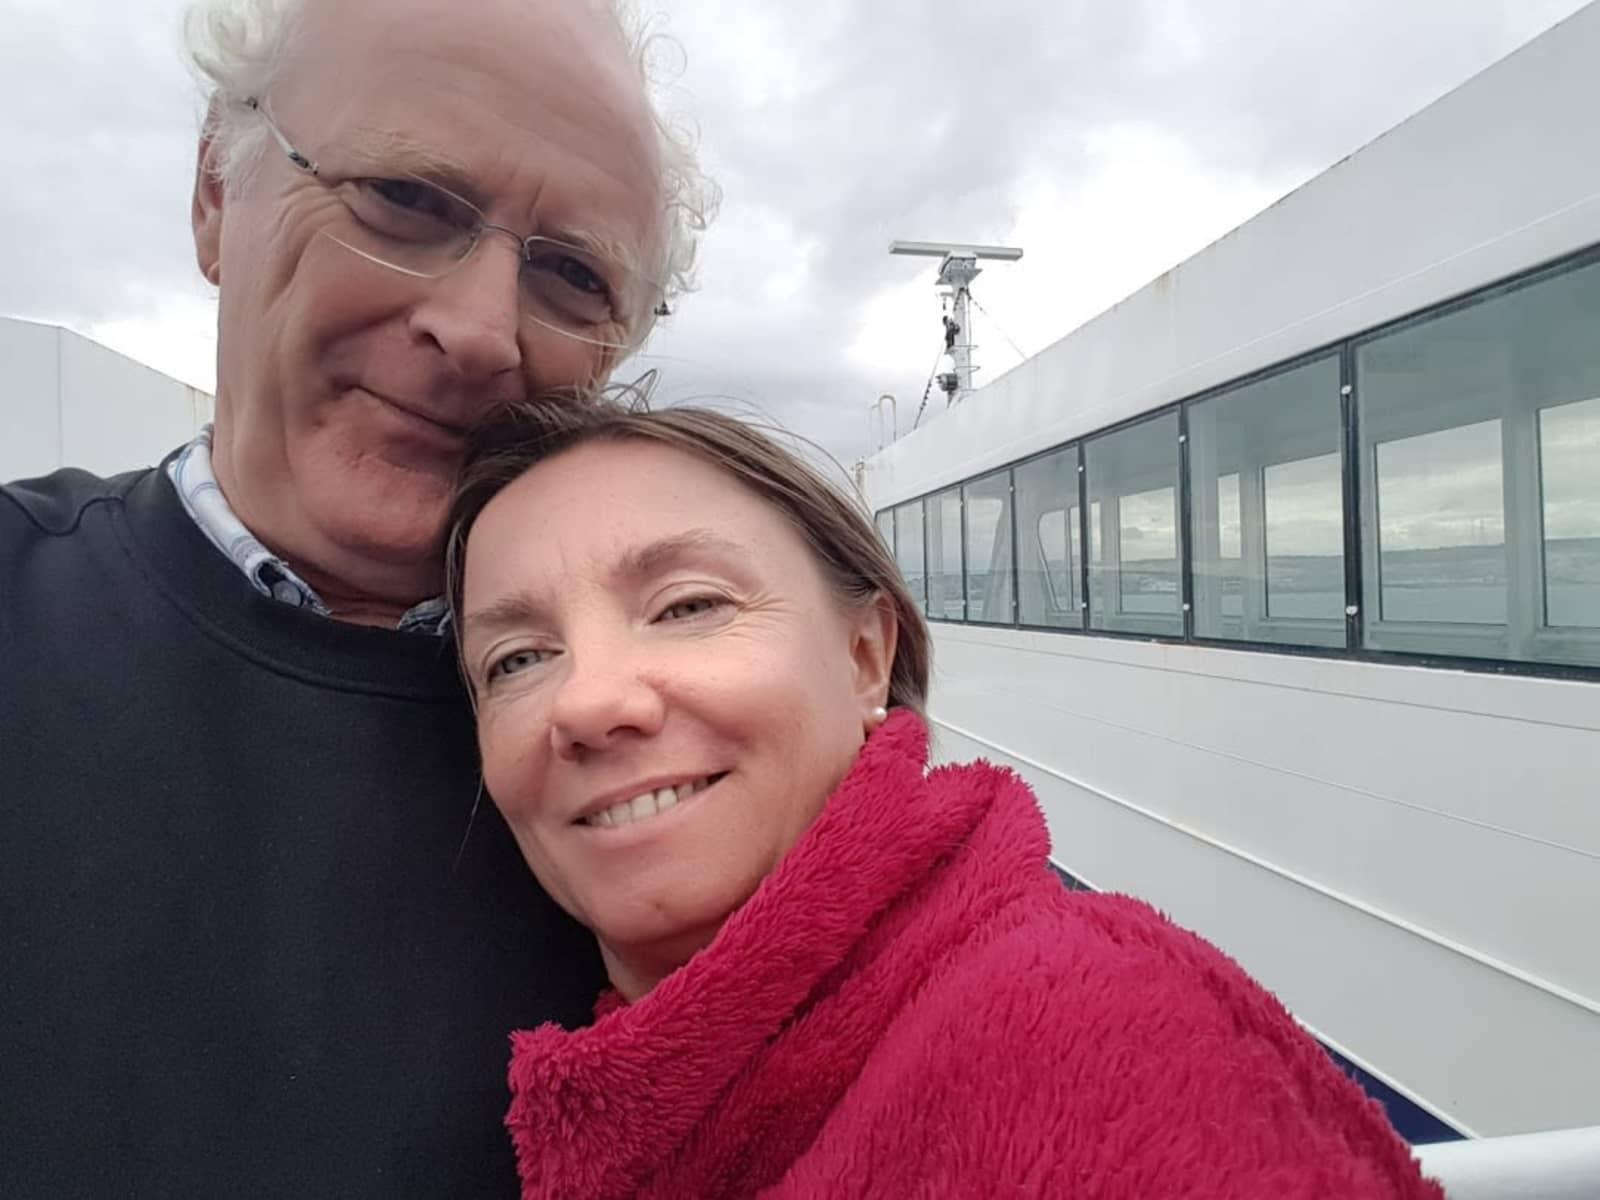 Adrian & Agnieszka from Birmingham, United Kingdom